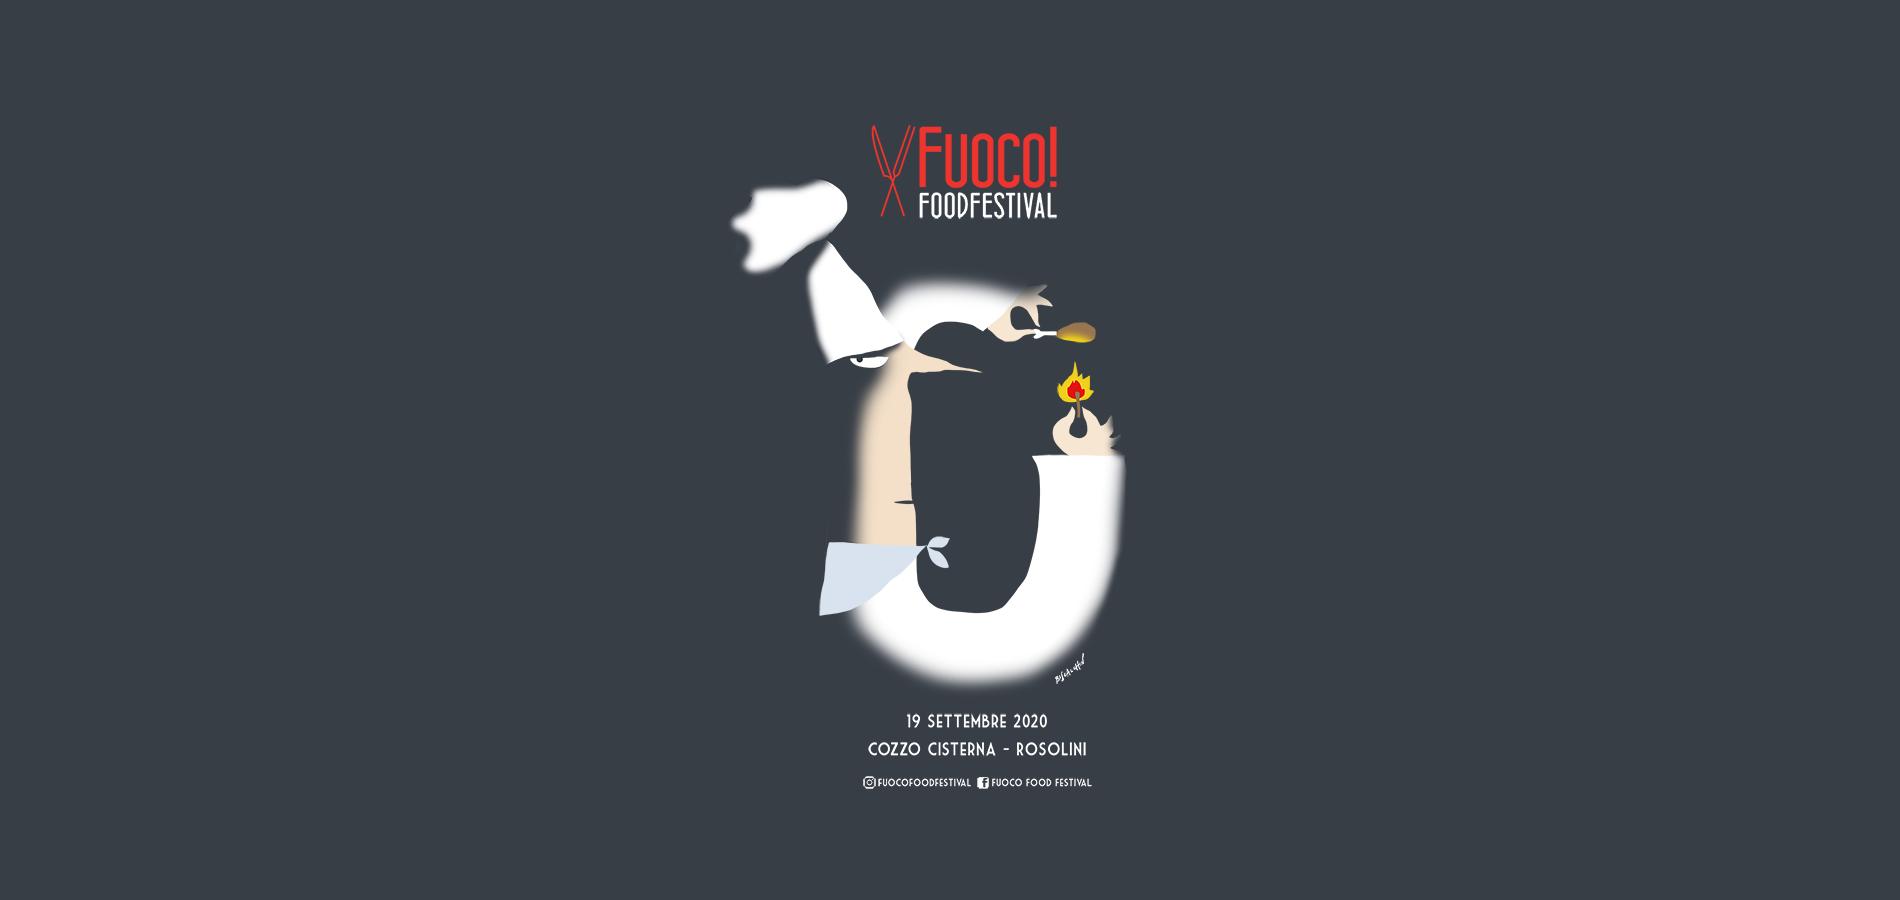 Fuoco Food Festival 2020